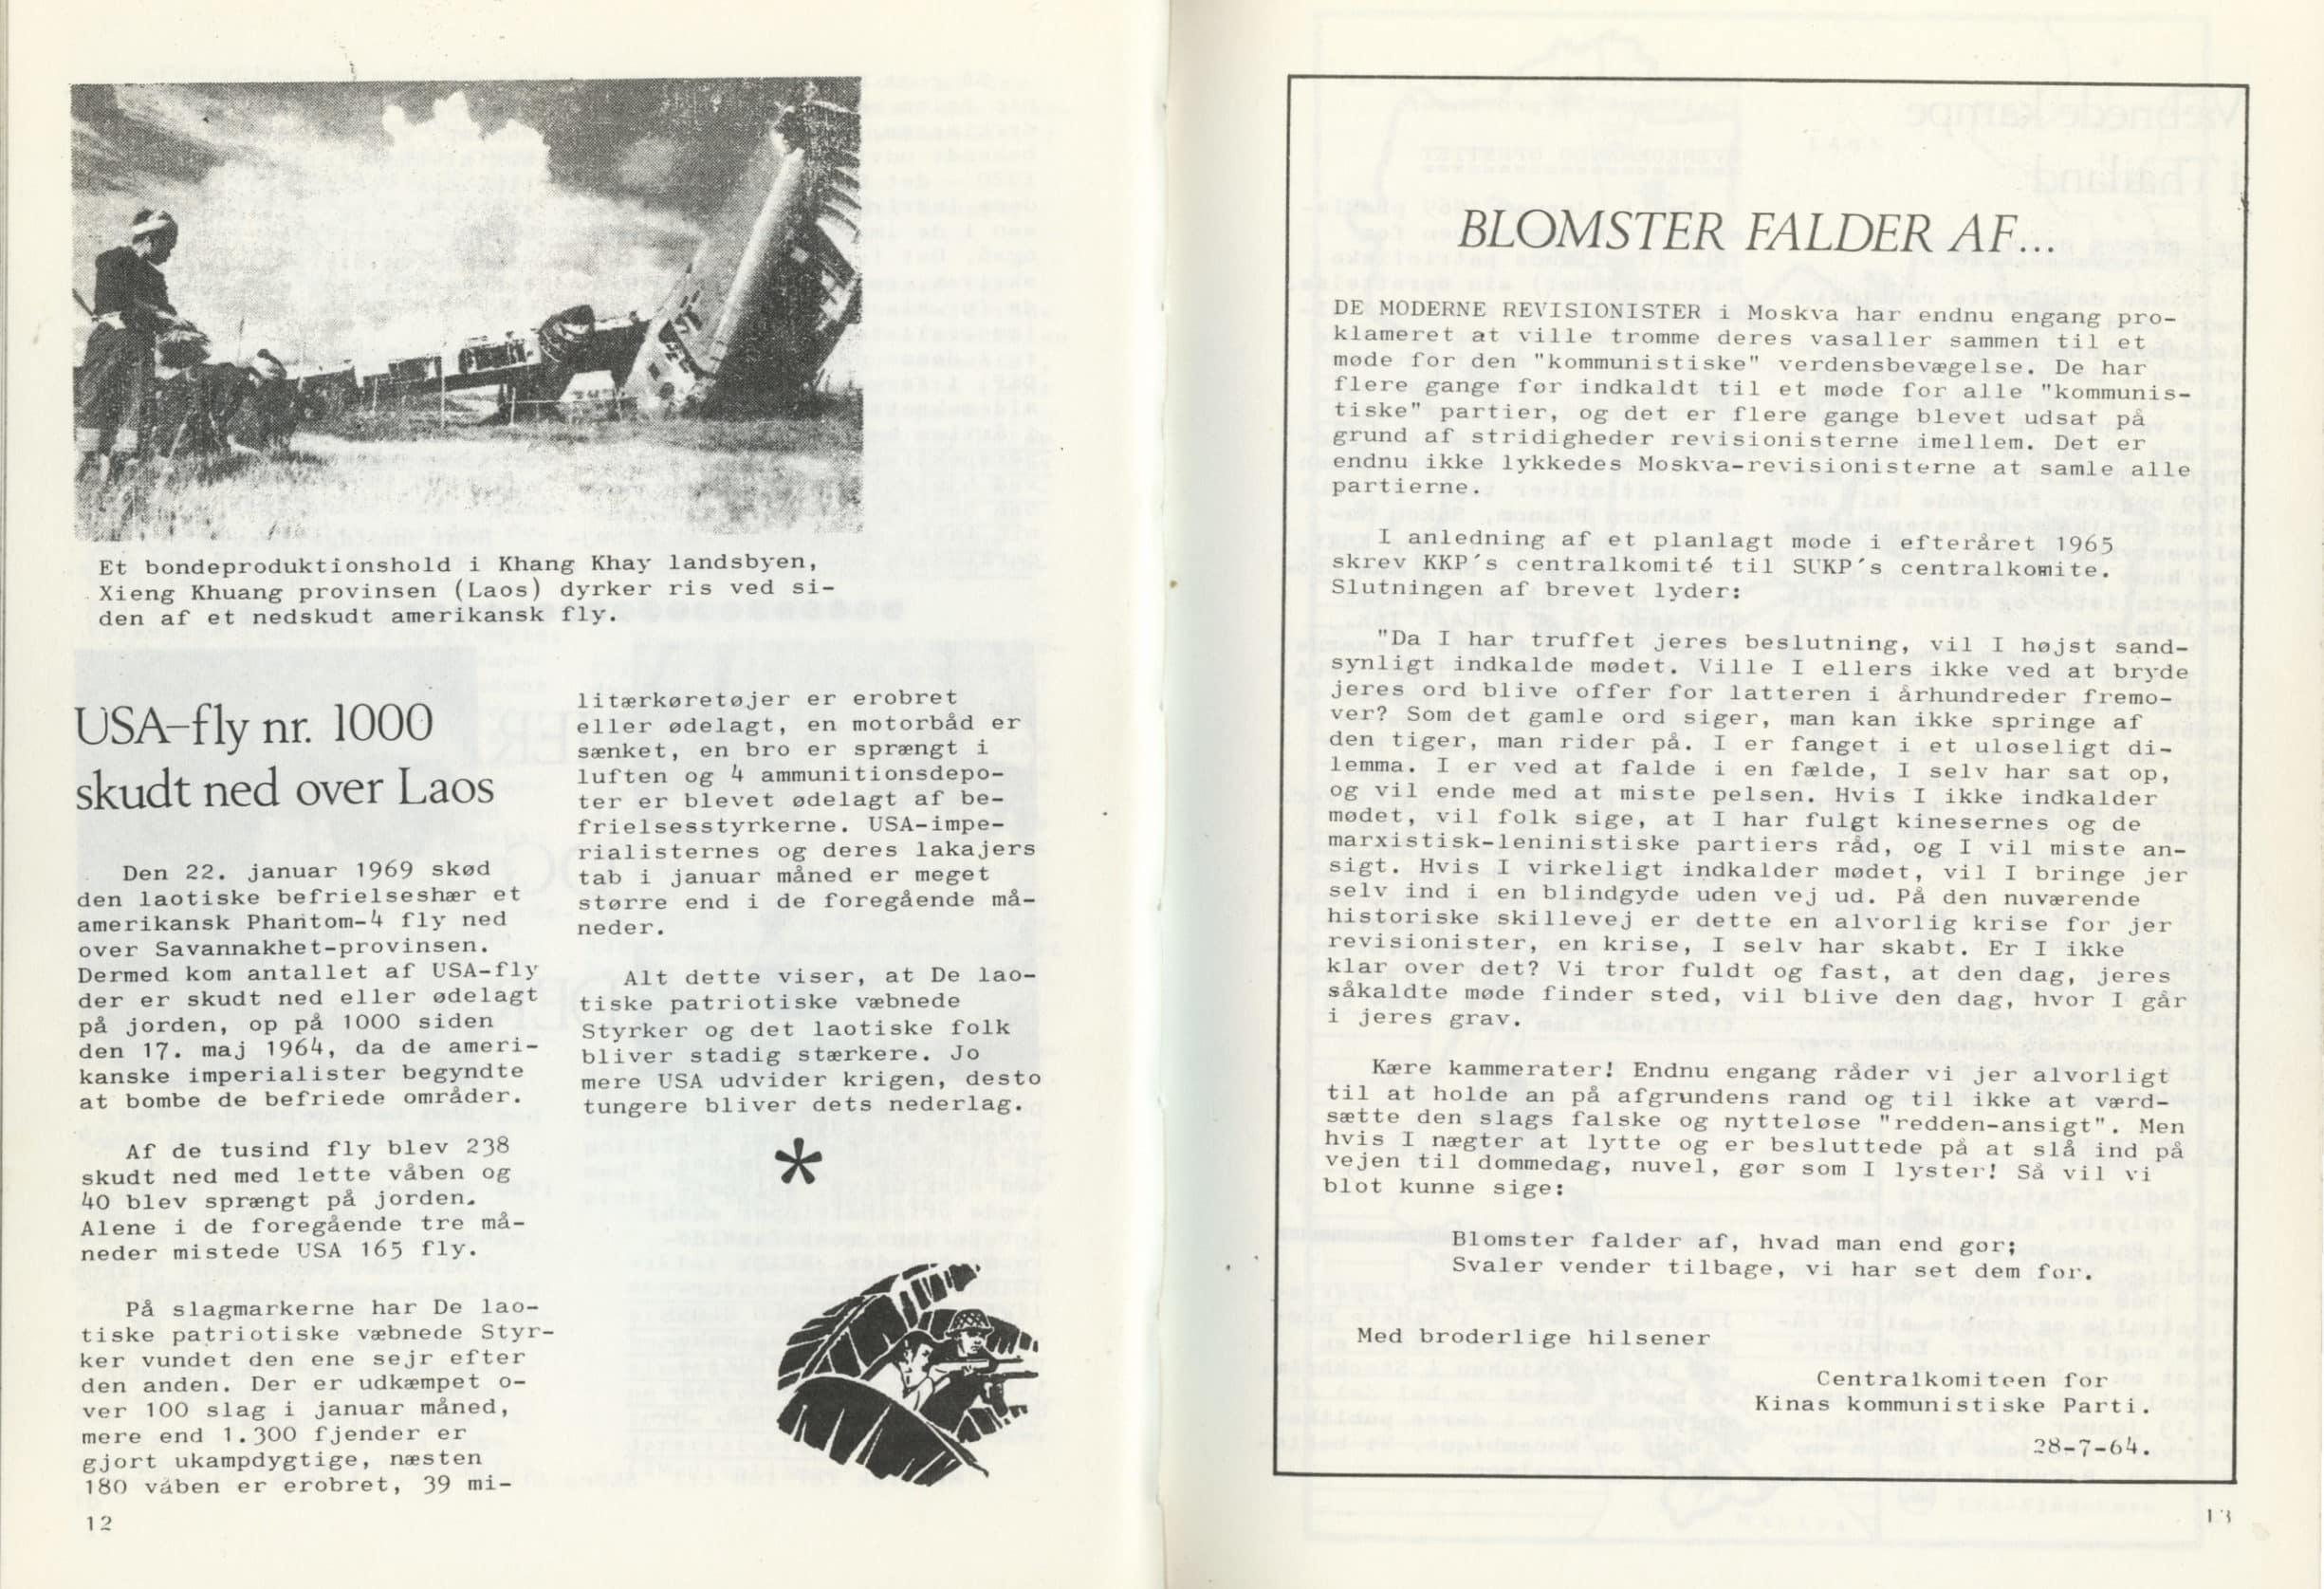 Ungkommunisten1969, nr. 4, s. 12-13.